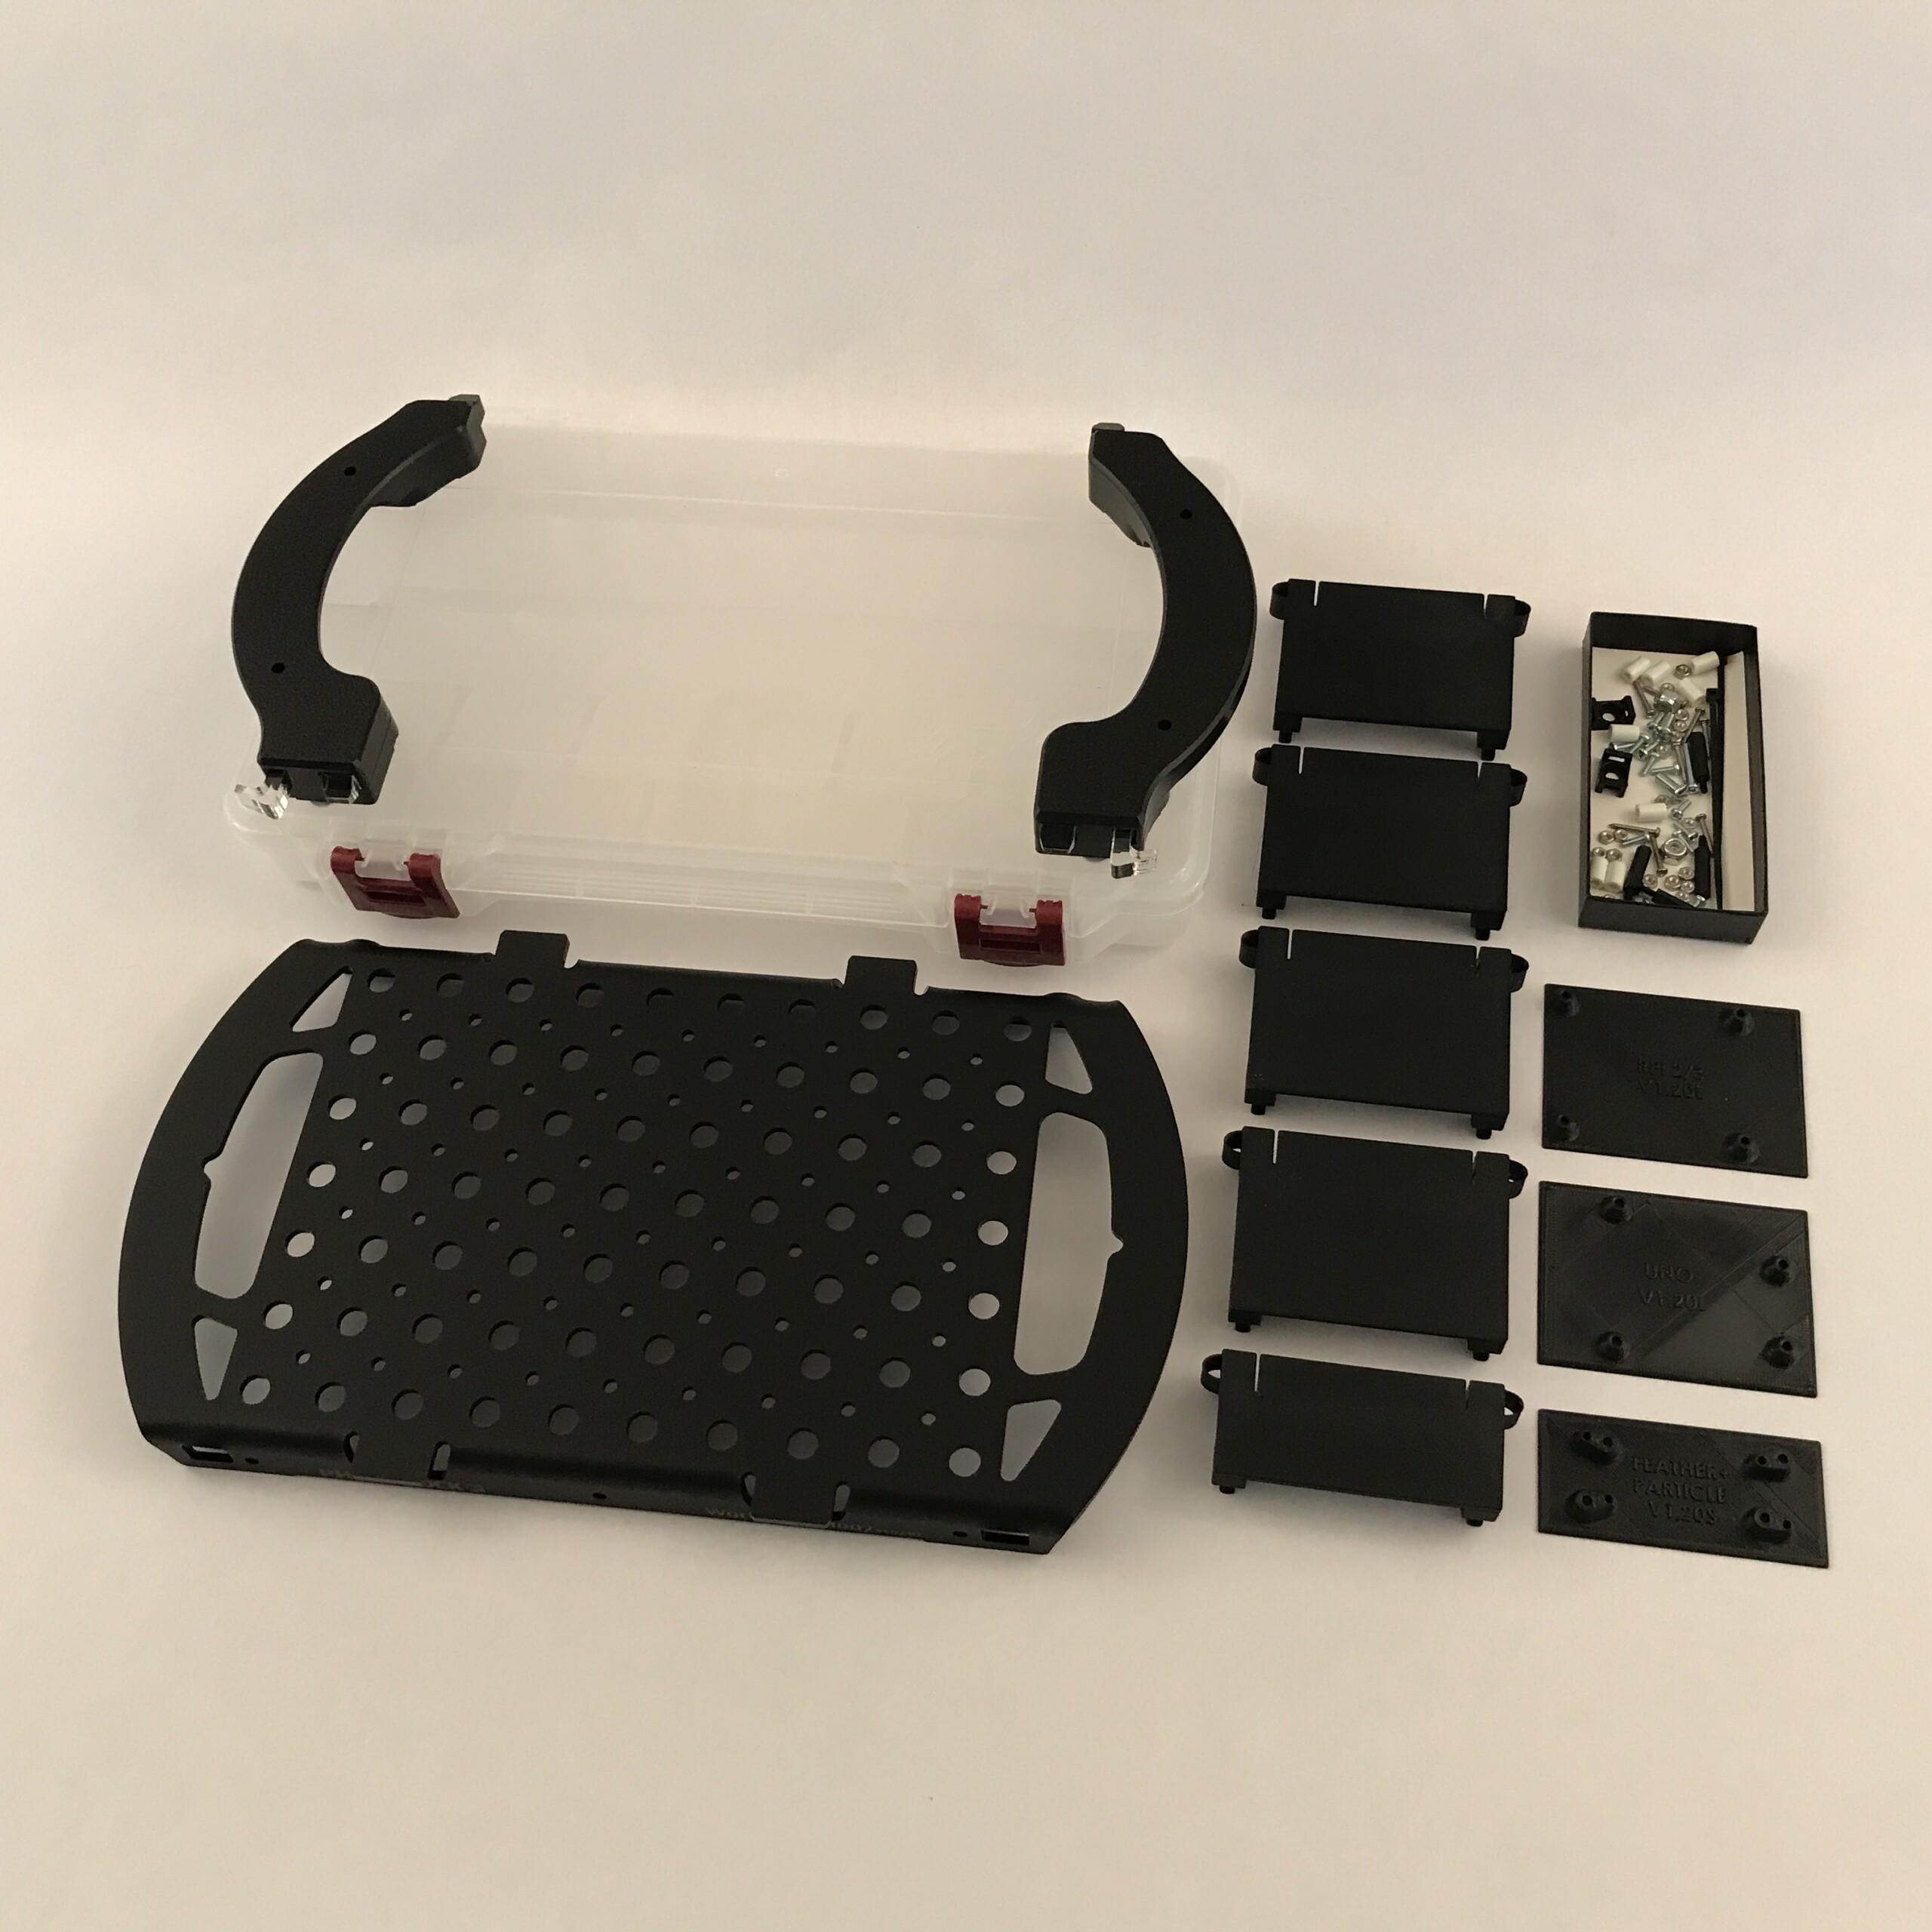 WorkBench-IO Starter Kit